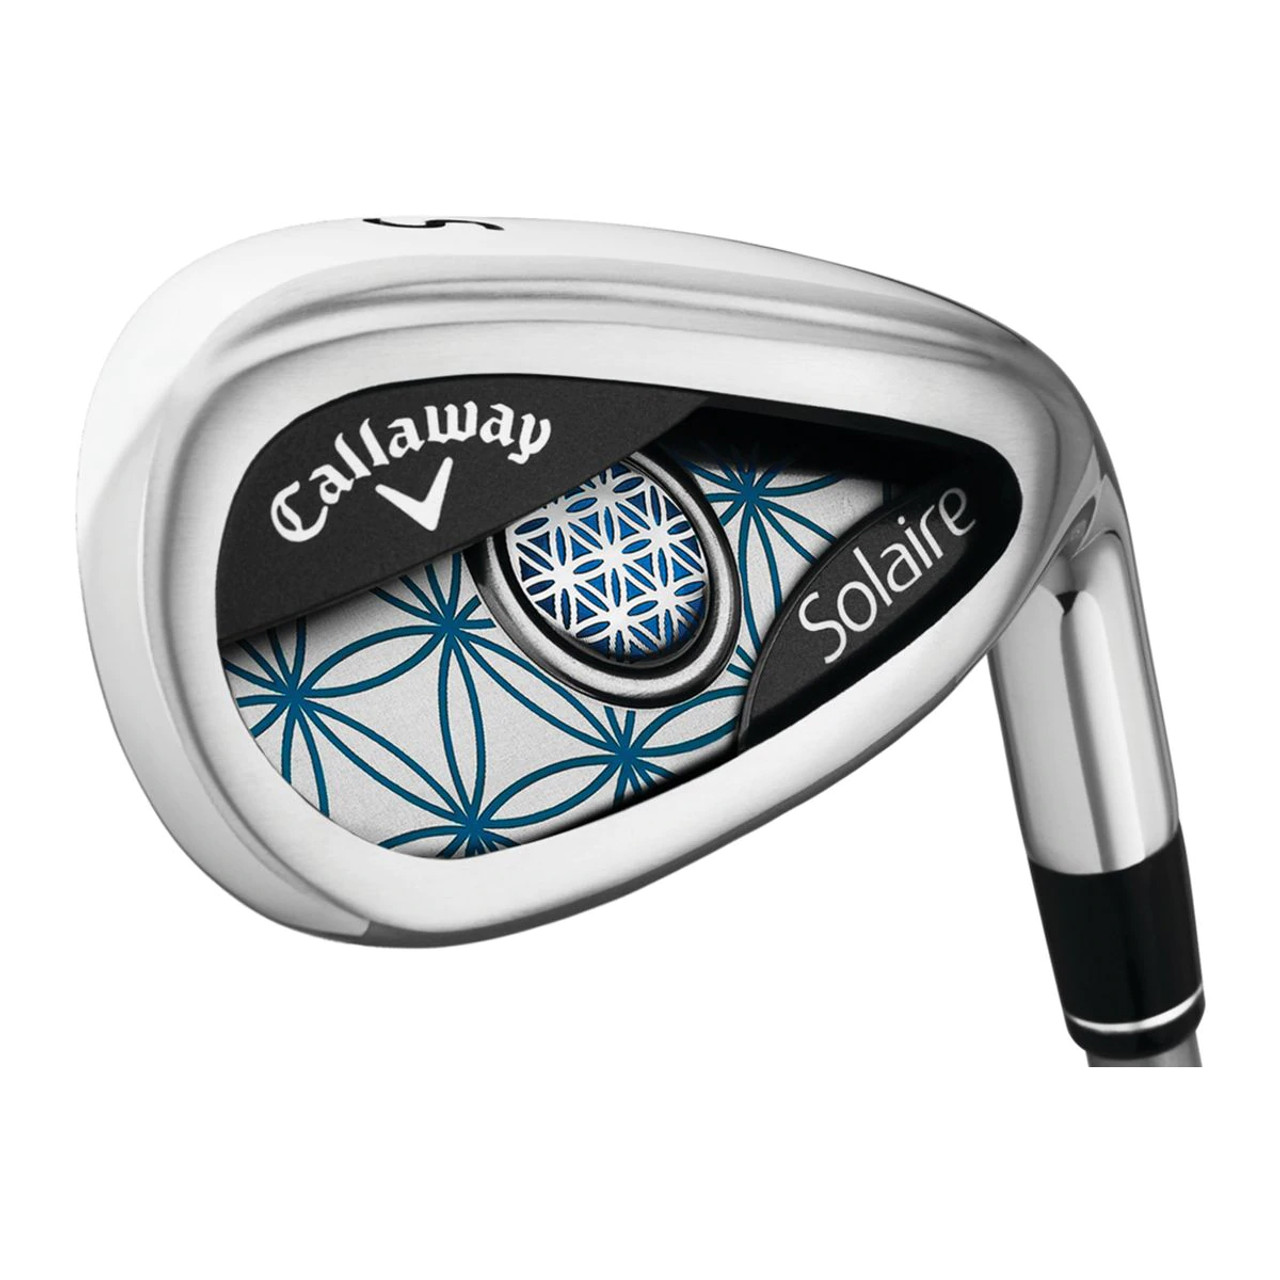 Callaway Womens Solaire 11 Piece Golf Niagara Blue Wedge